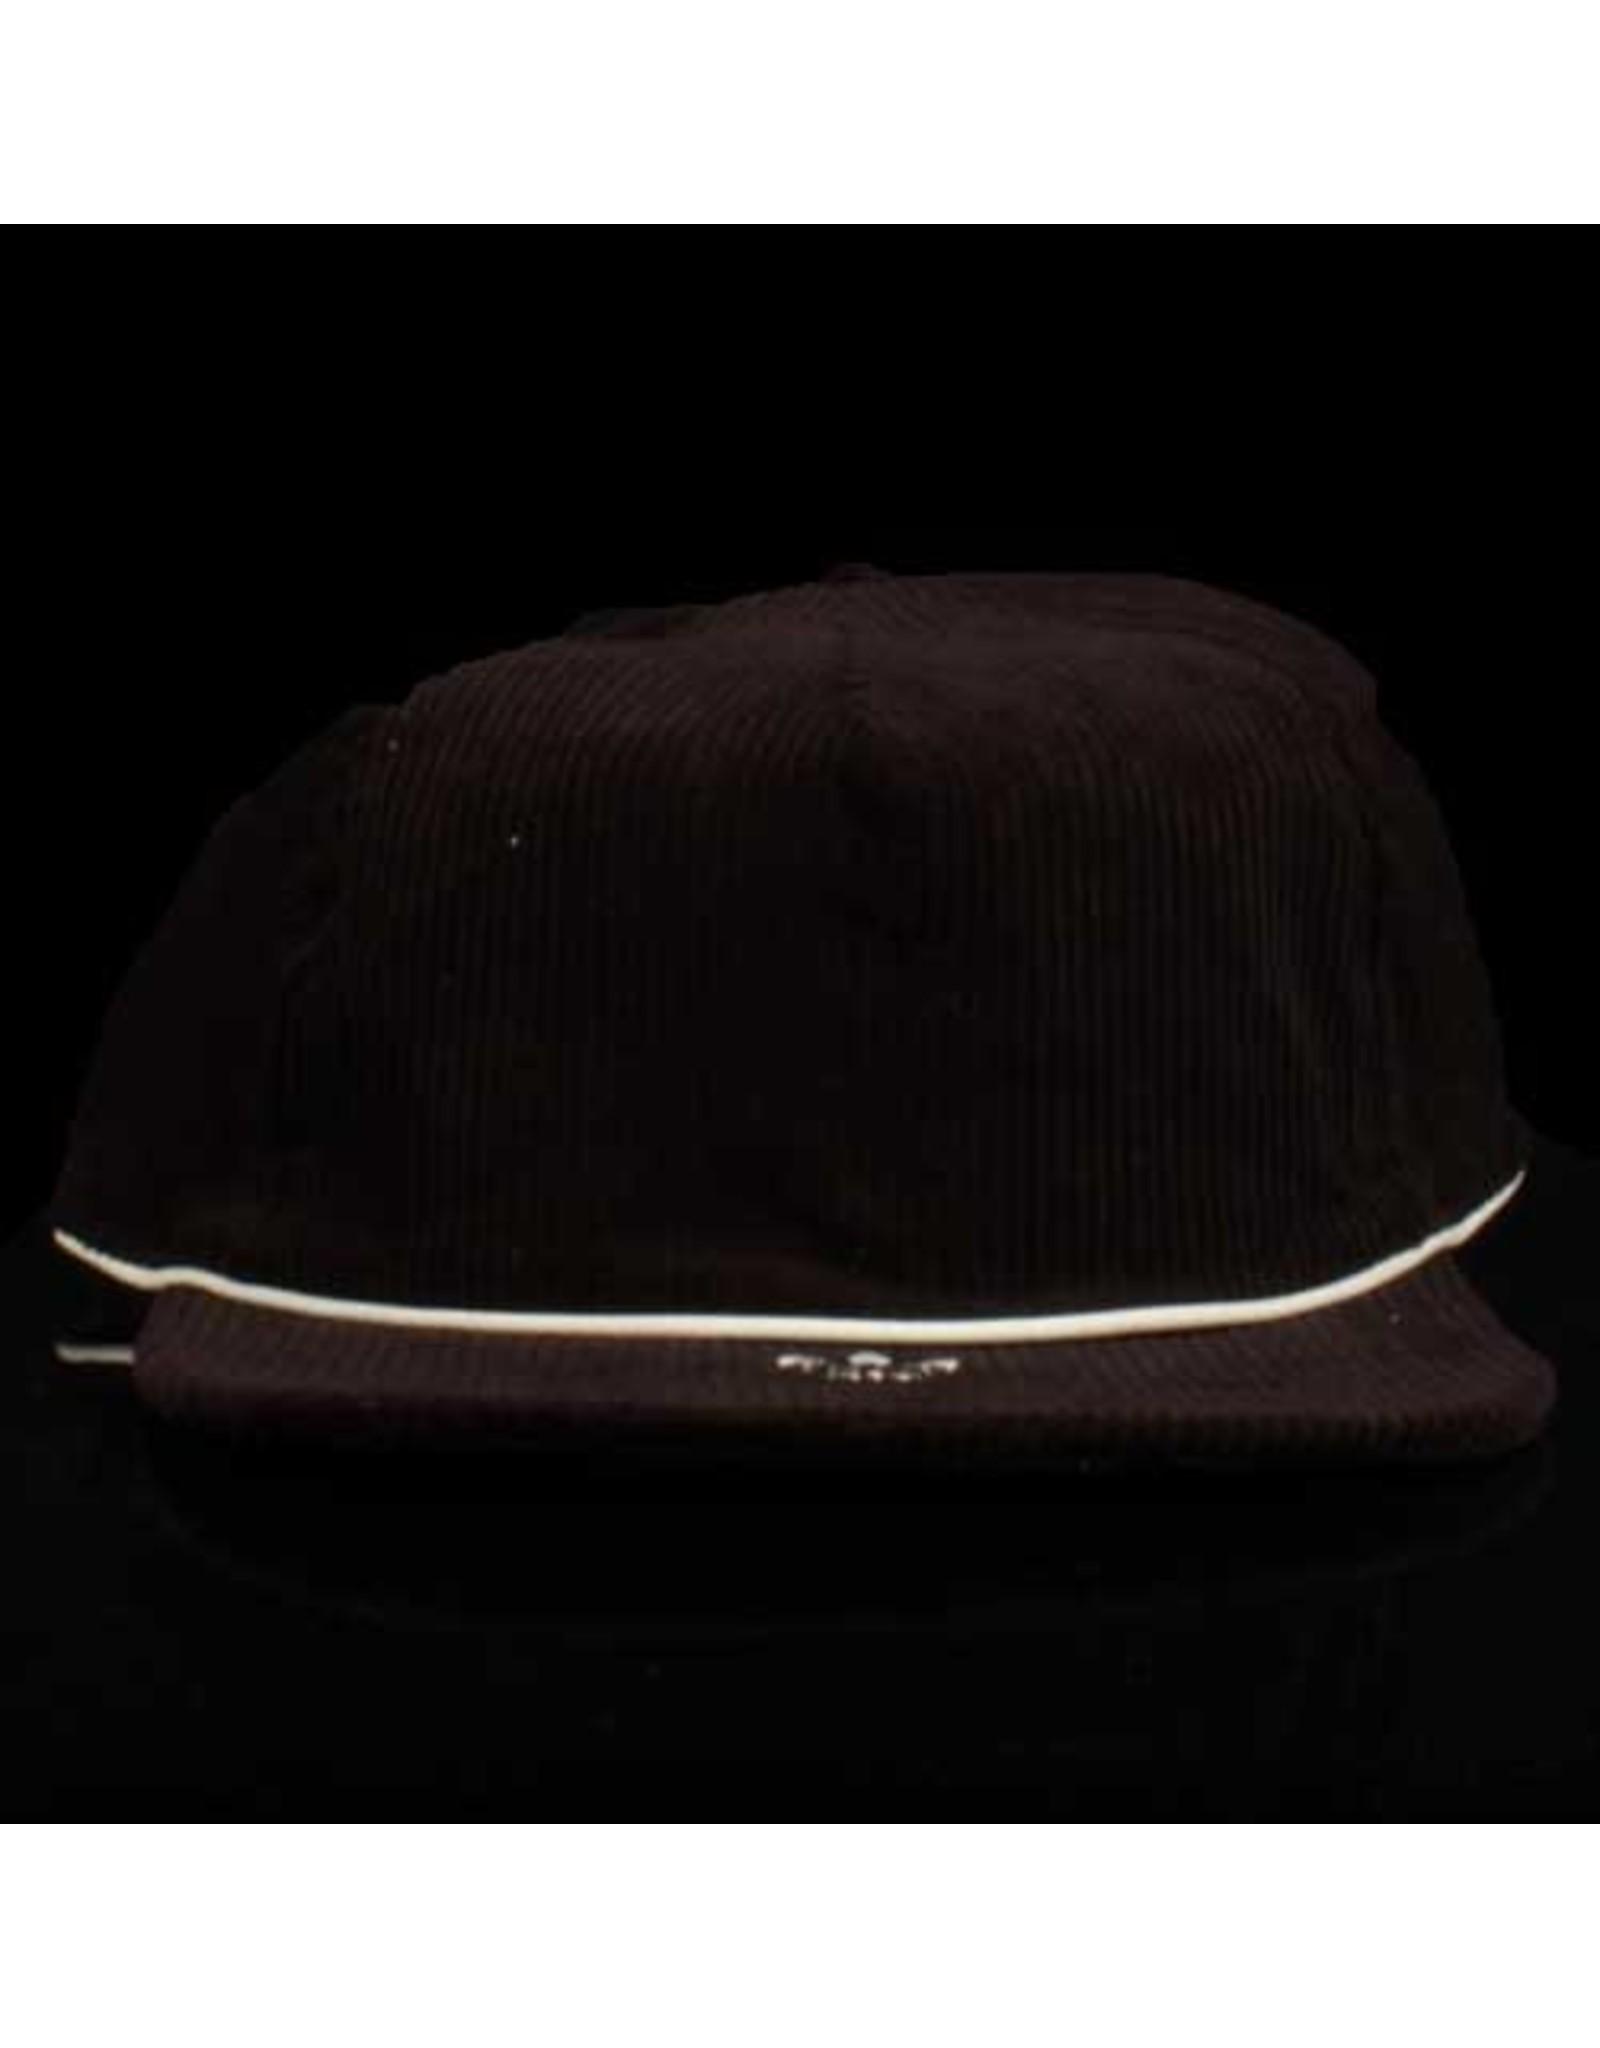 ADIDAS Adidas Hat Corduroy 6 Panel Strapback Black White Embroidery